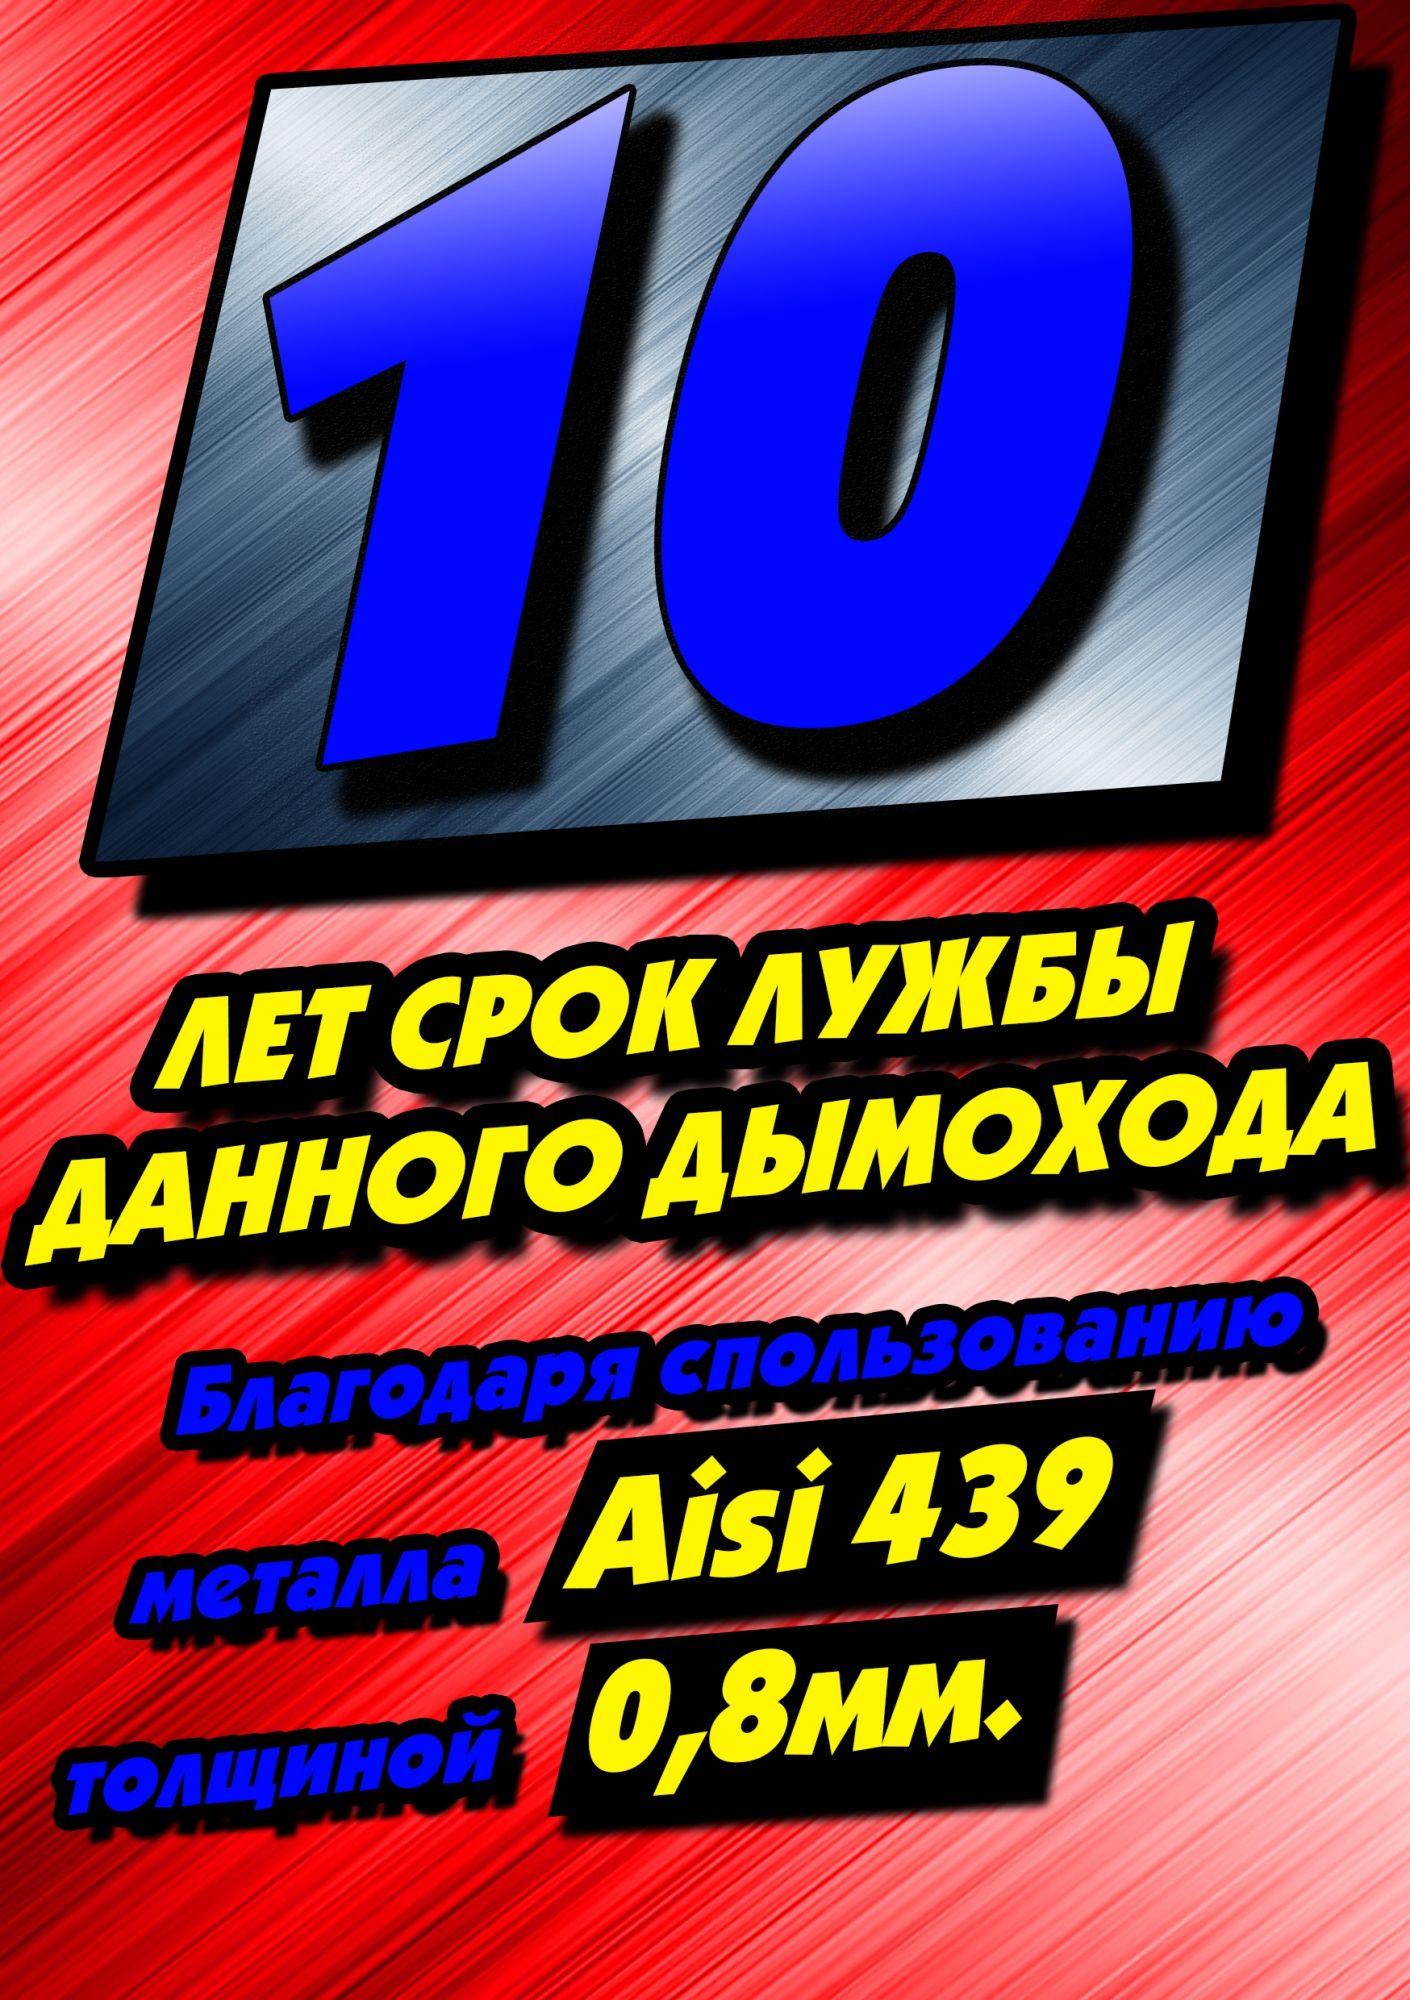 Наклейка на дымоход - дизайнер Vegas66